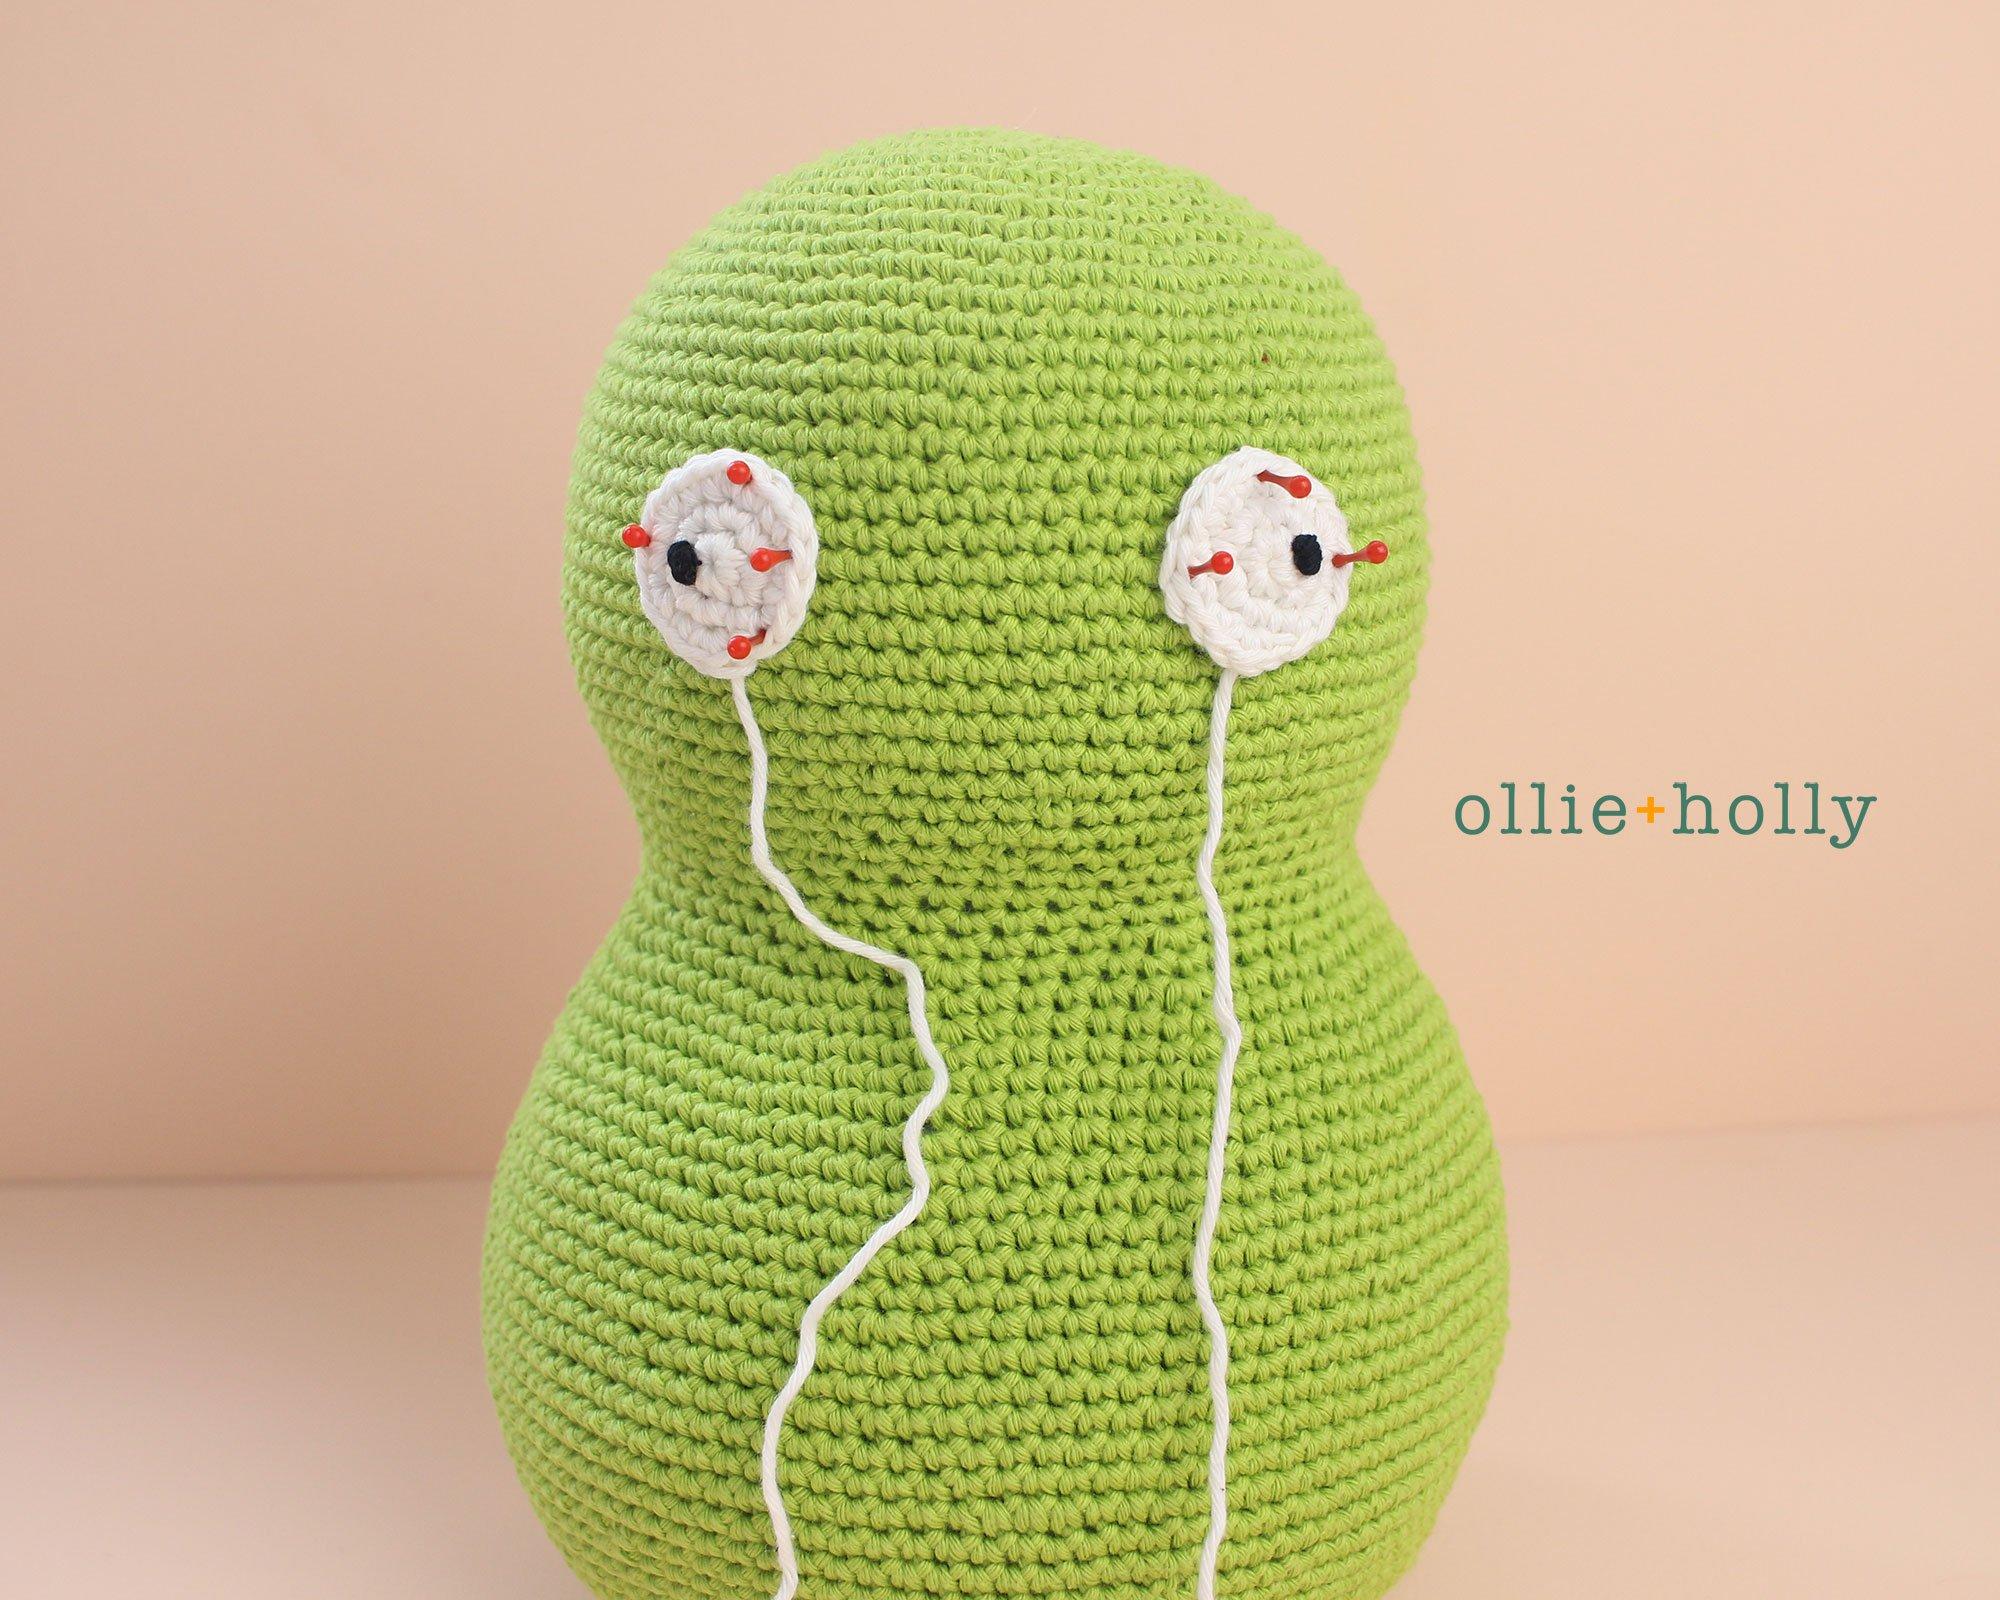 Free Louise Belcher's Stuffed Animal Kuchi Kopi (from Bob's Burgers) Amigurumi Crochet Pattern Step 7